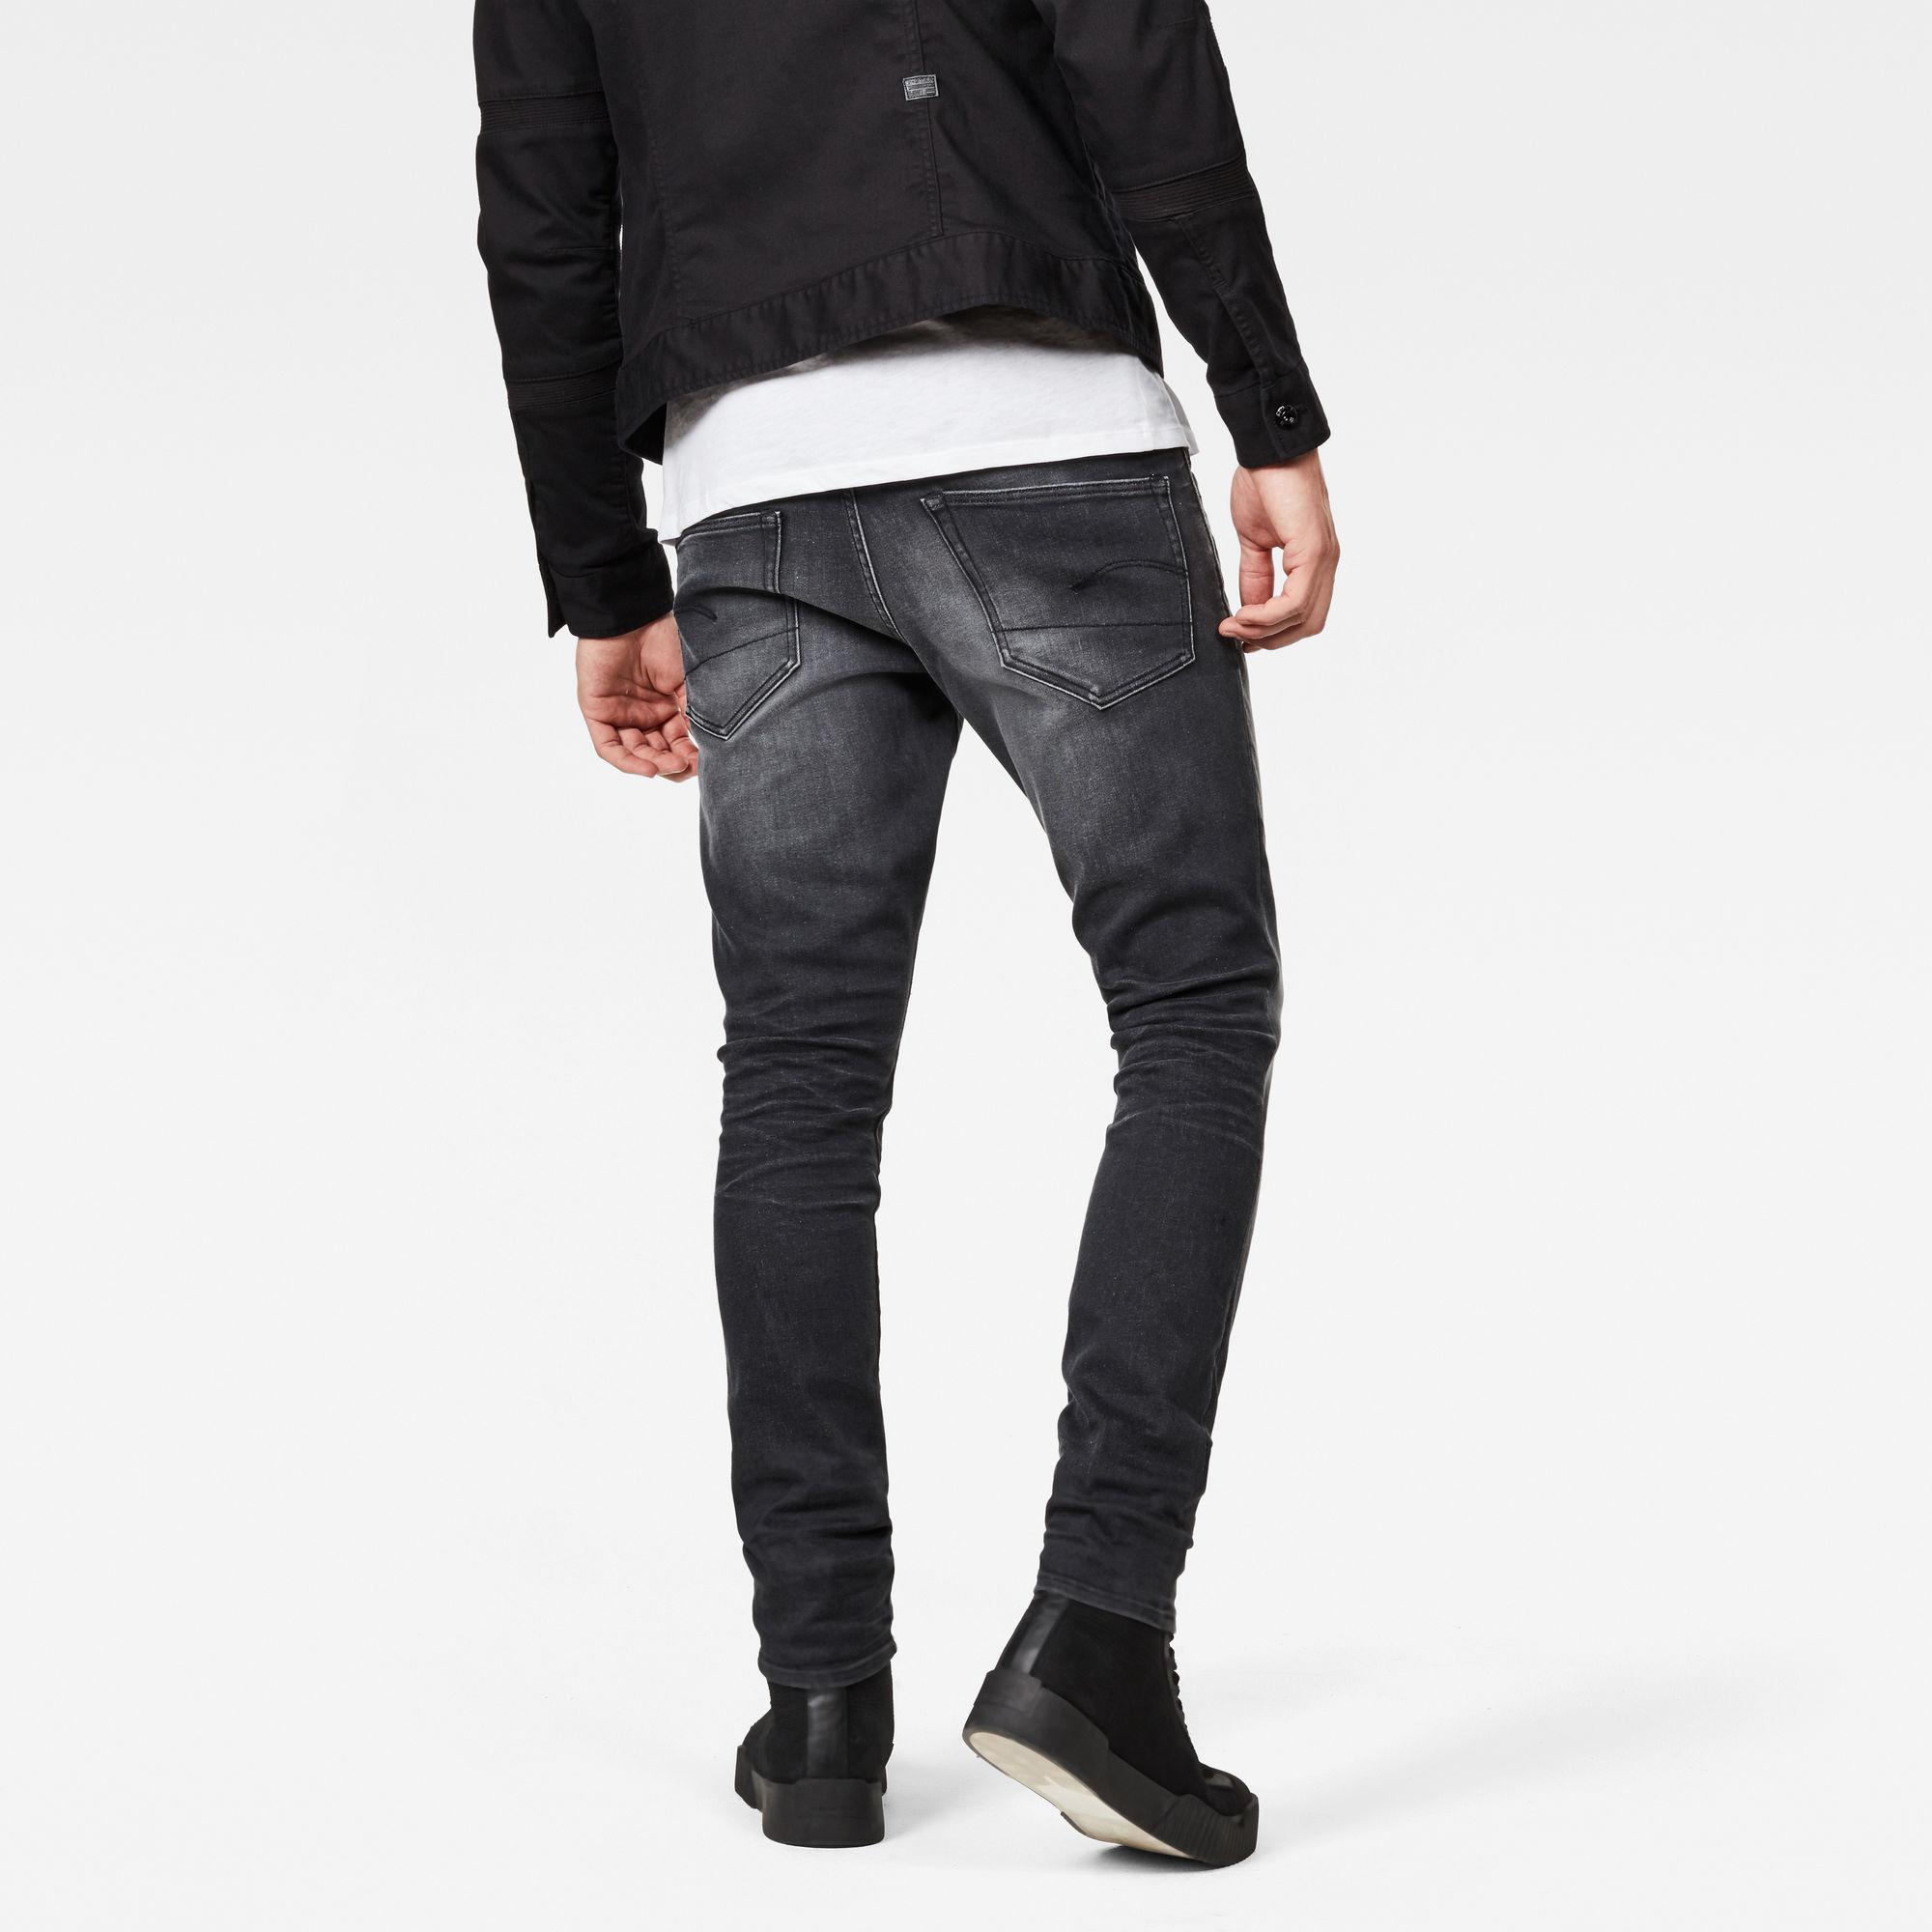 3301 Deconstructed Super Slim Jeans